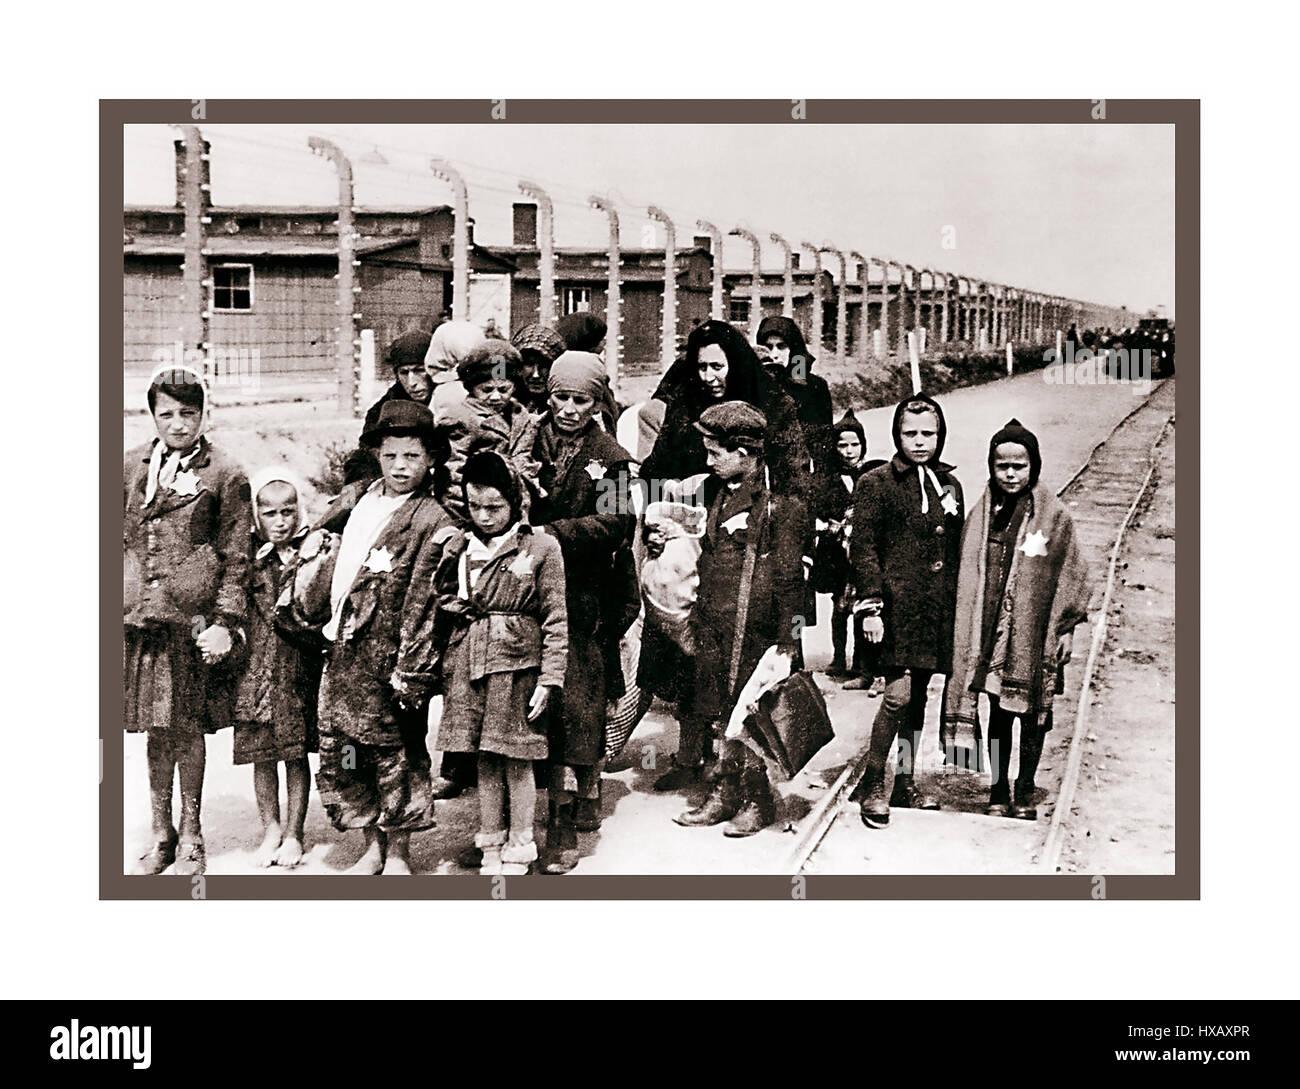 Jewish children wearing Nazi designated yellow stars arrive in Auschwitz-Birkenau.  A WW2 German Nazi Concentration - Stock Image